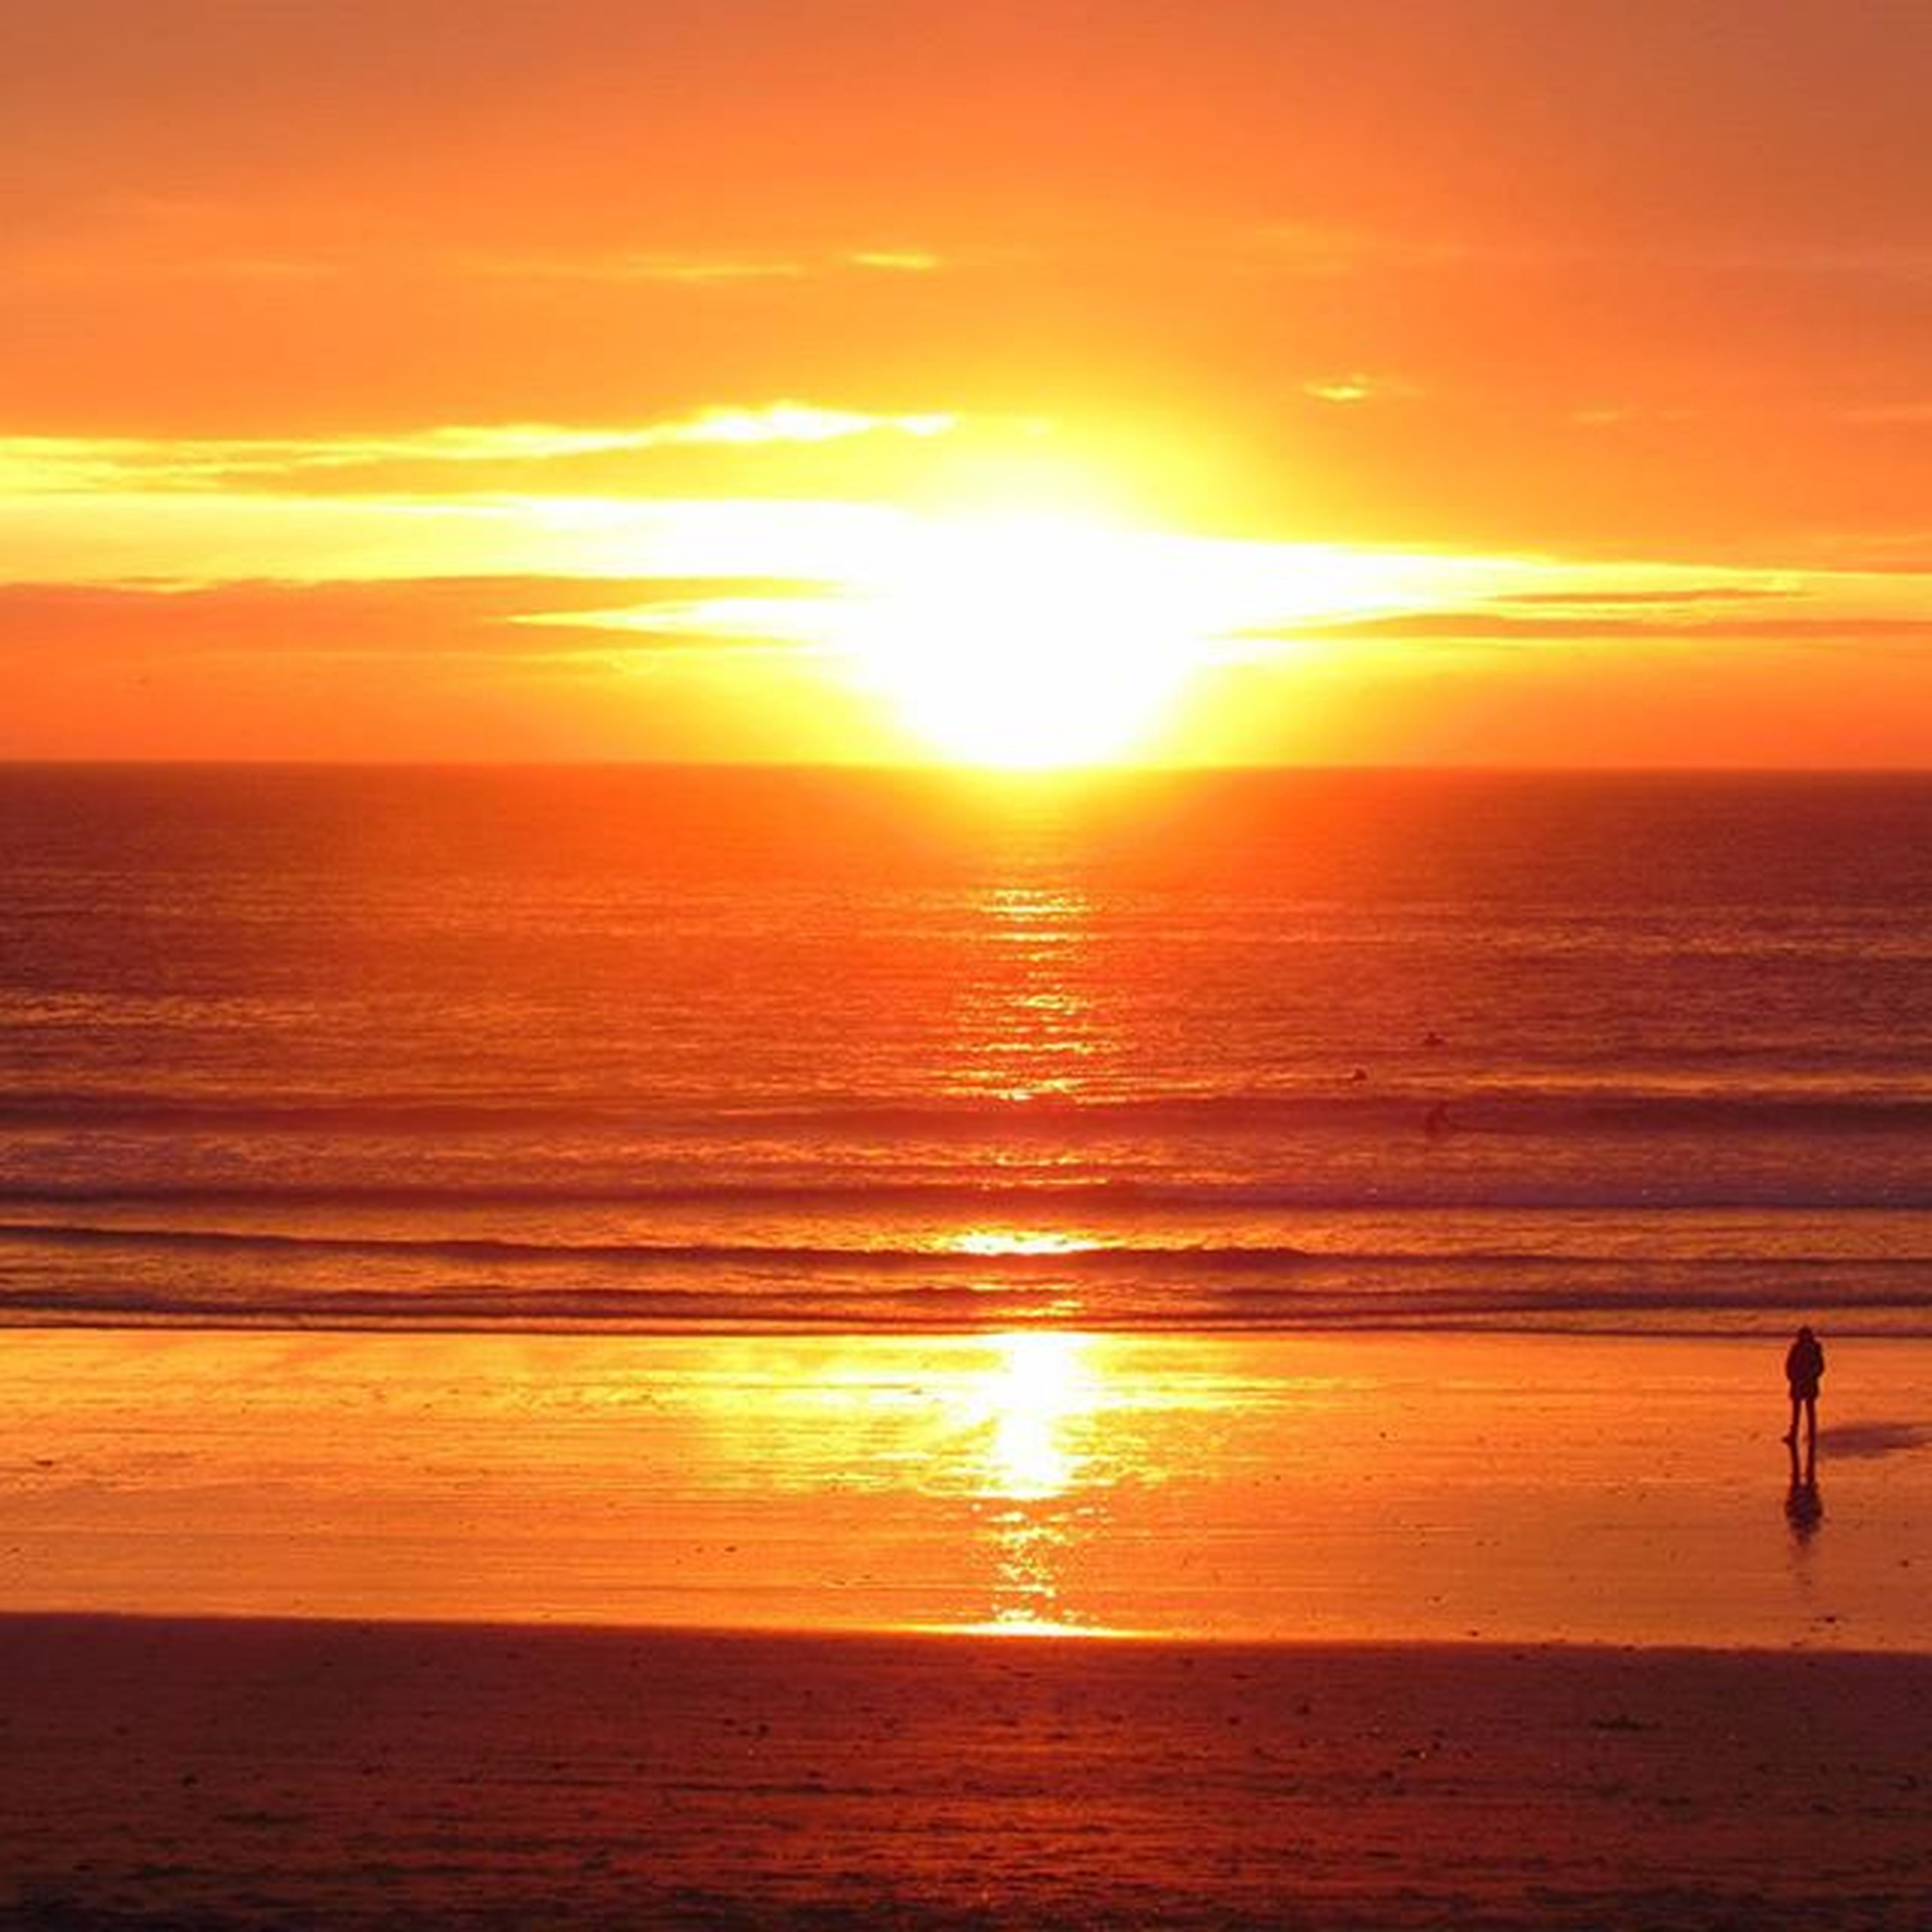 🌅 Surfing days, magic moments with friends... 📷Sunset Lalanzada Surfplaces Galifornia Canonshot Beaches Autumn Surfers Lanzadabeach Galiciancaribbean Magicsunday Sun Galiciacalidade Sea Canon